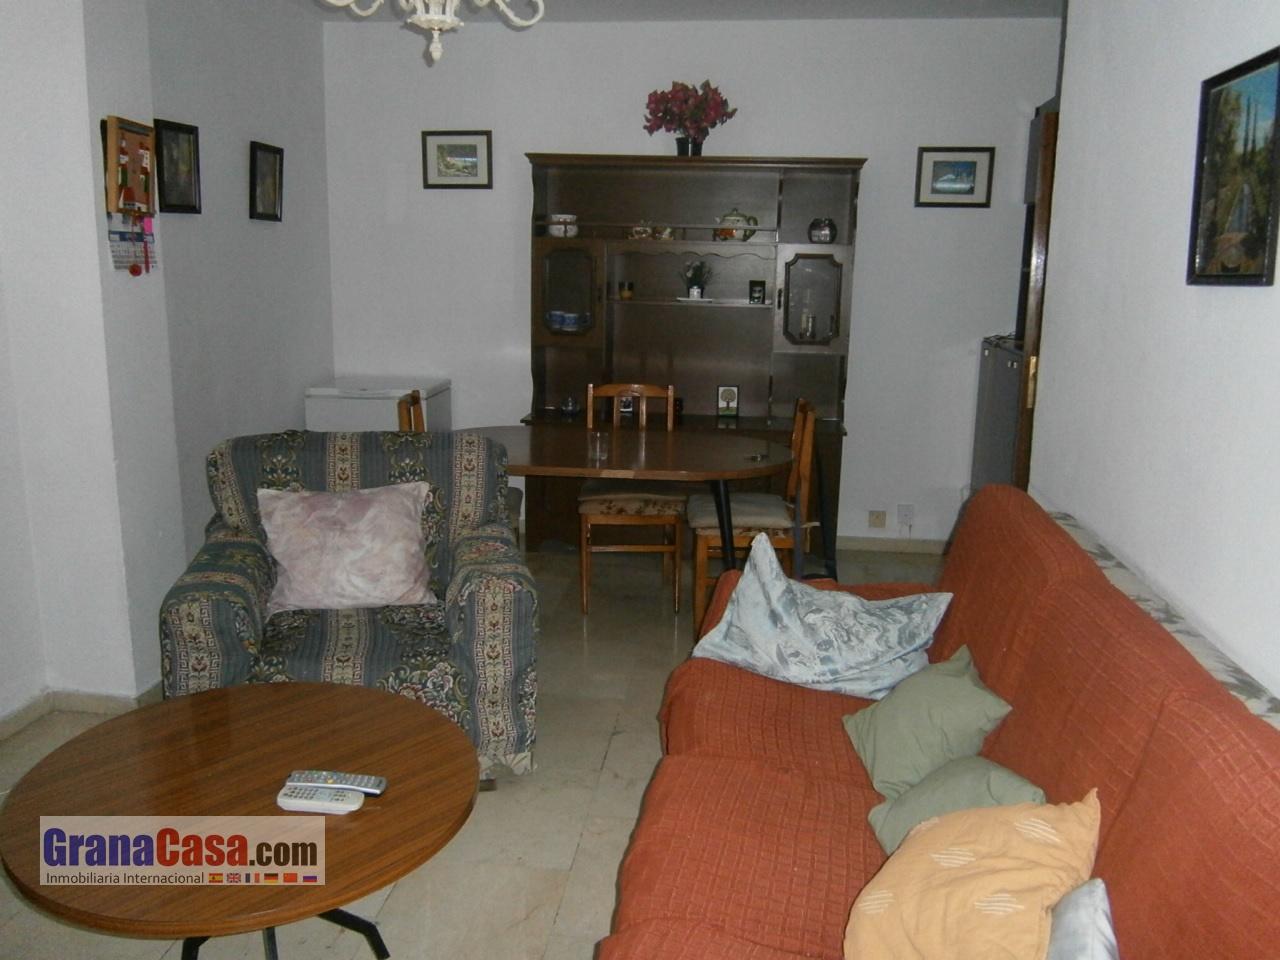 Alquiler piso en zona trauma con 3 dormitorios - Alquiler piso zona retiro ...